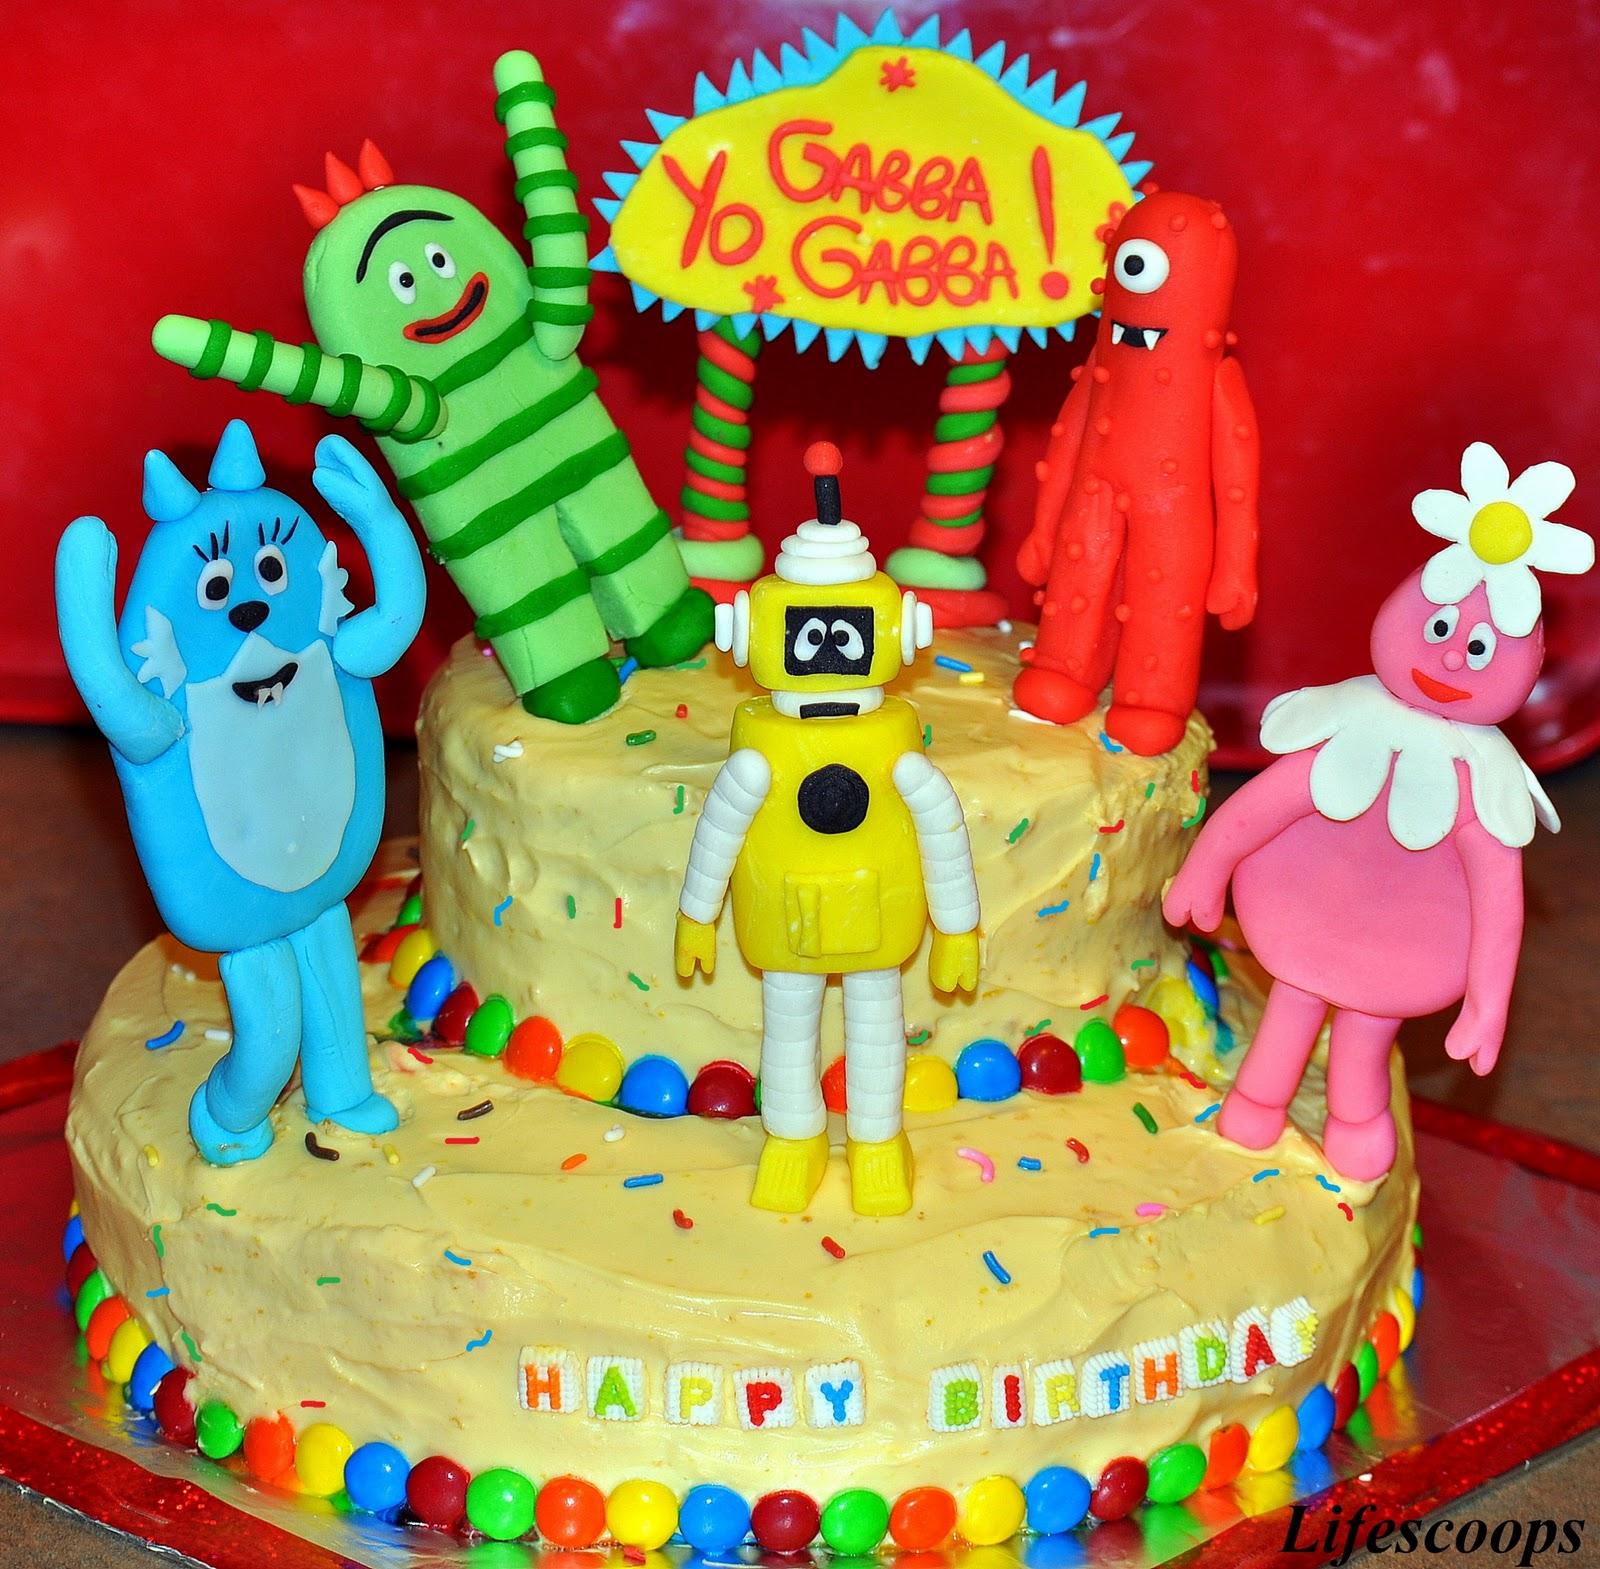 Life Scoops Yo Gabba Gabba Cake For Mikaela S 2nd